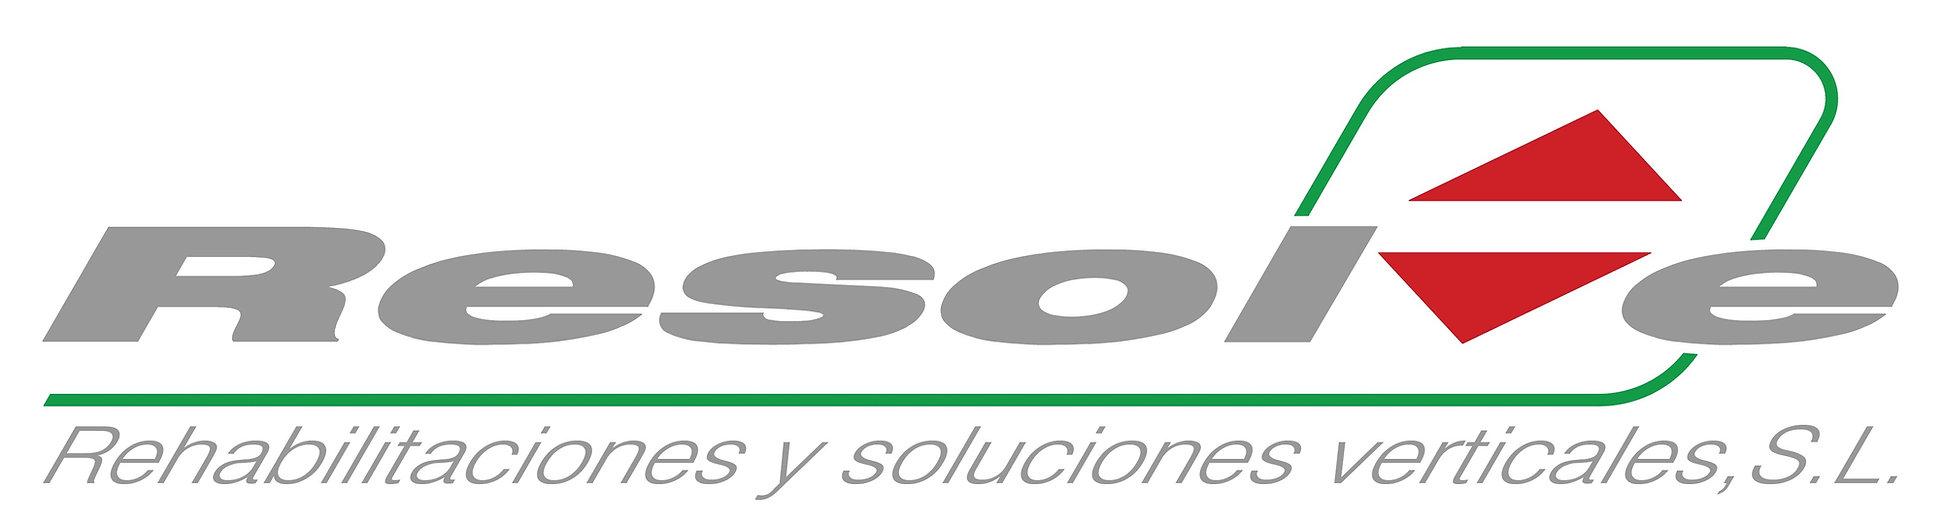 logo resolve.jpg